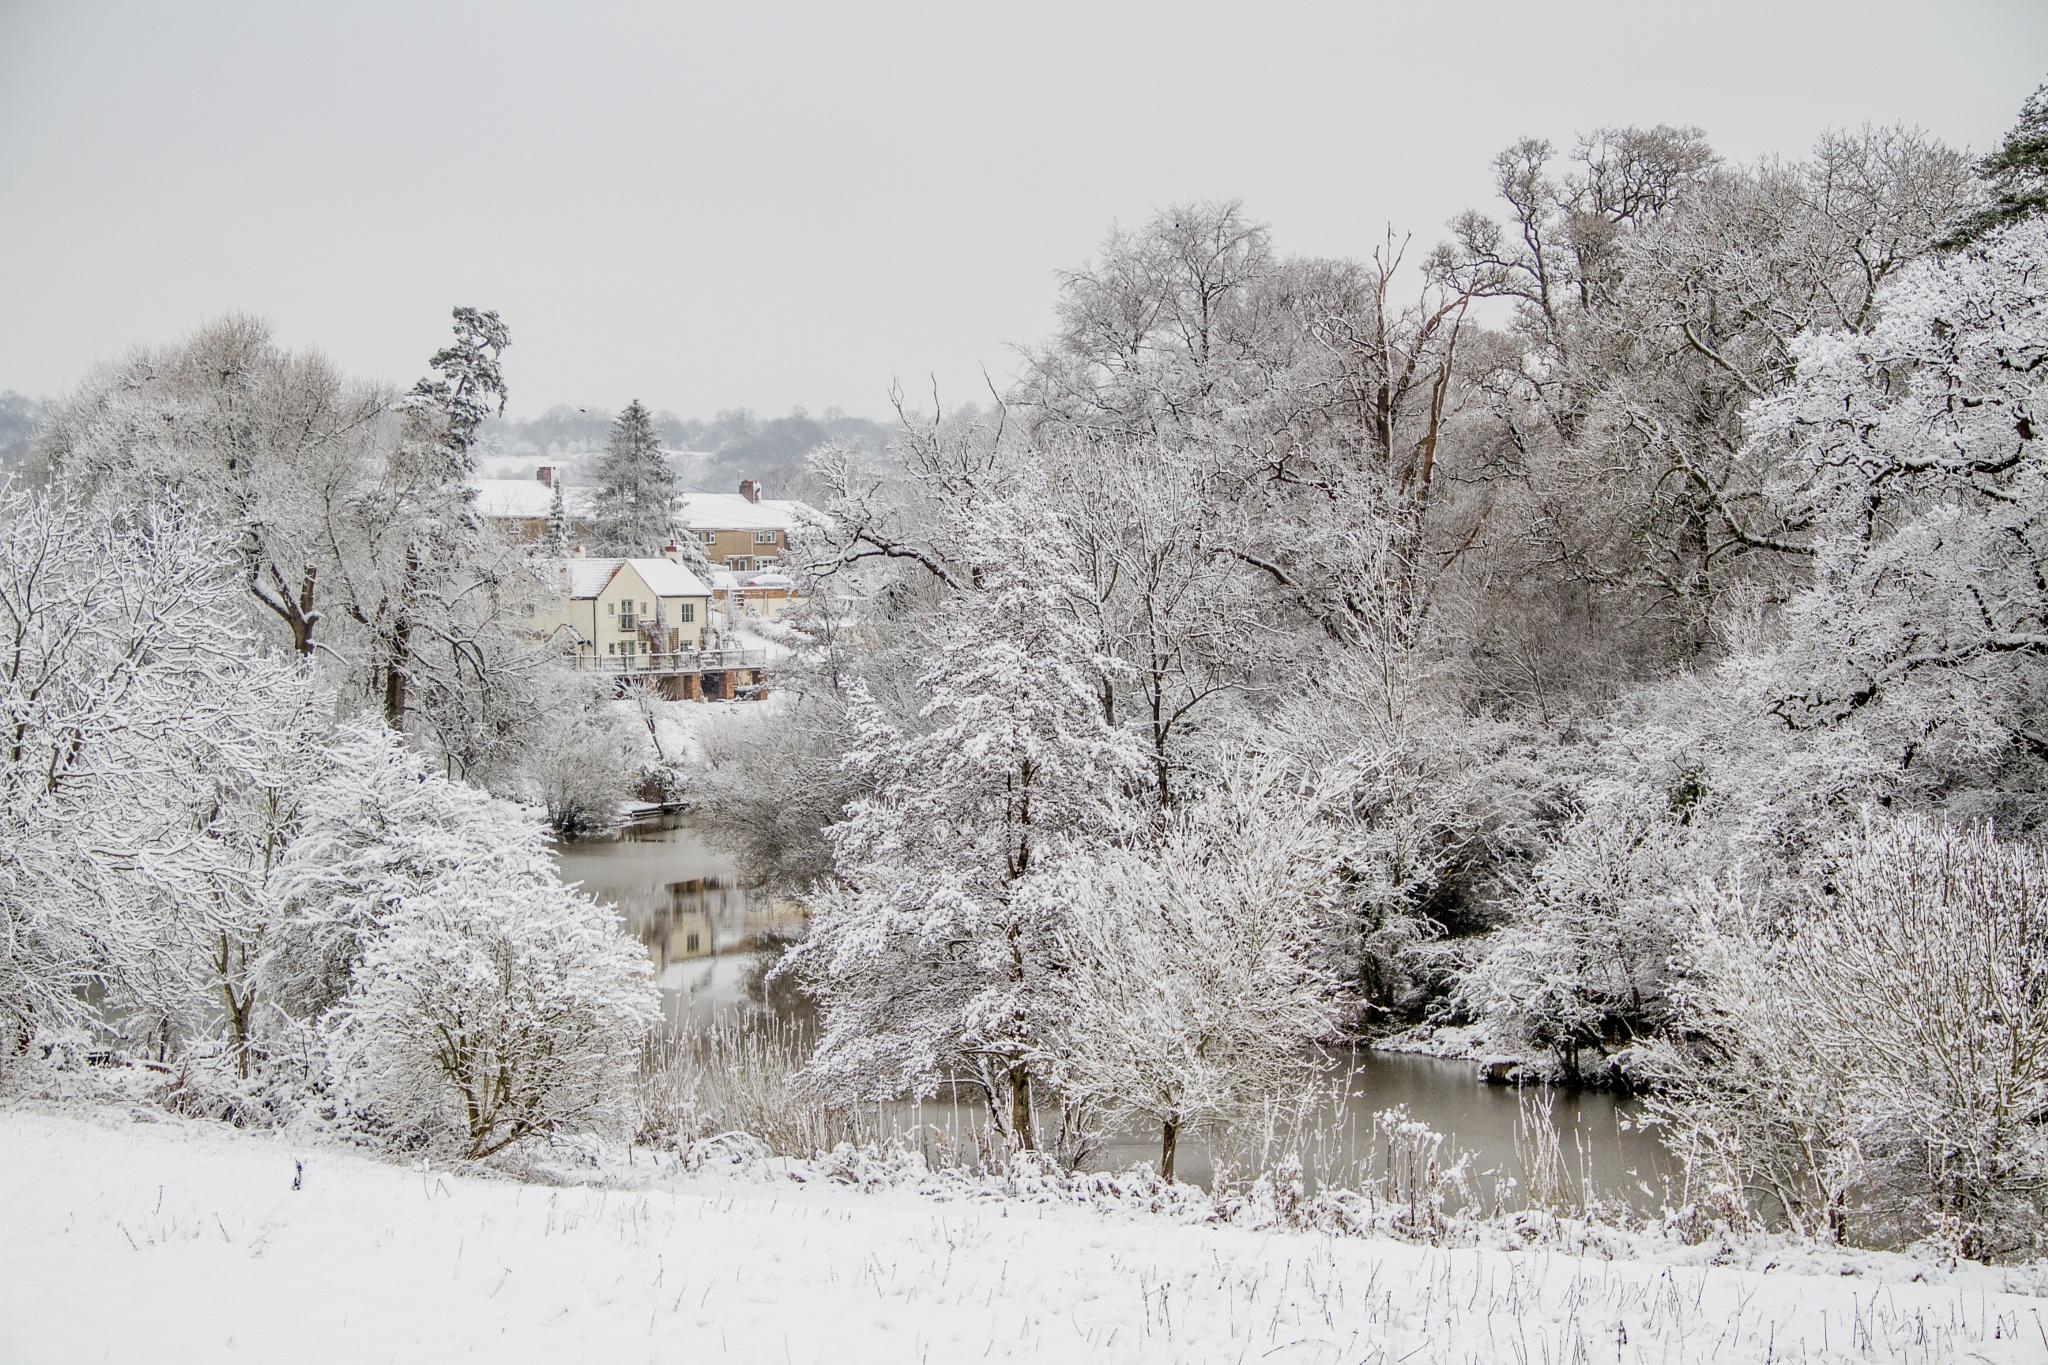 Winter Landscape by Russ Summers